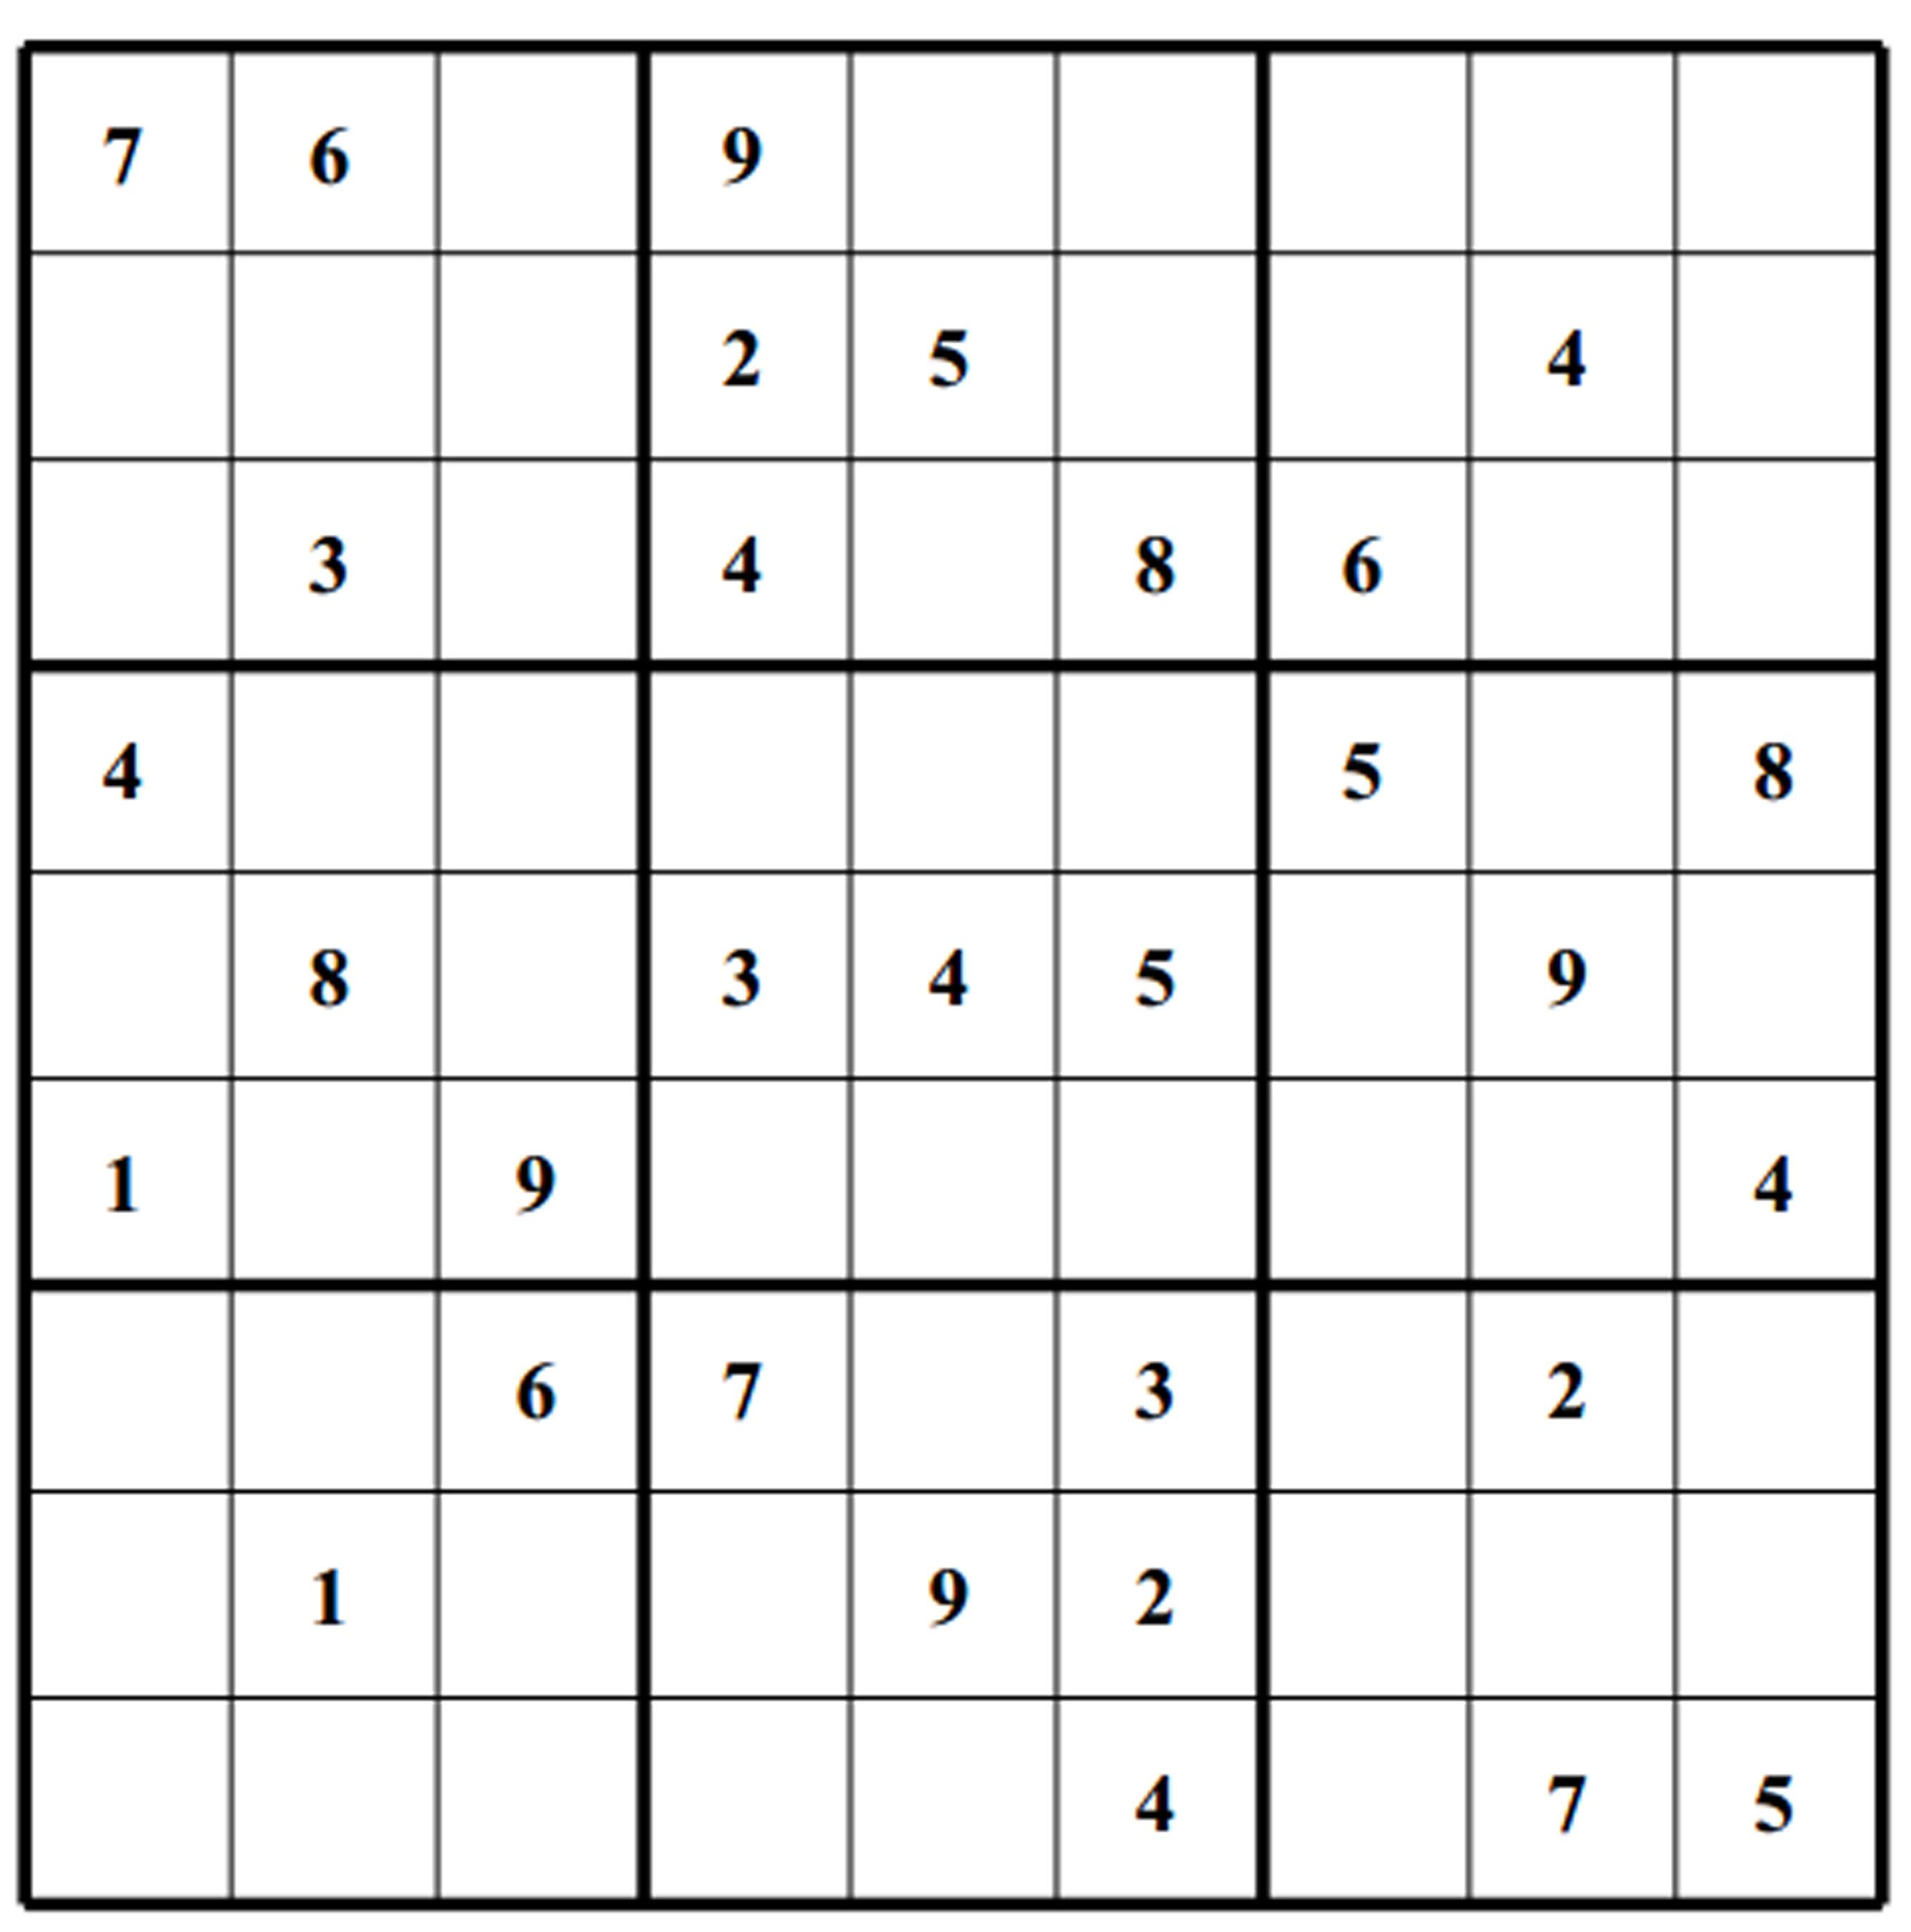 Free Sudoku Puzzles | Enjoy Daily Free Sudoku Puzzles From Walapie - 5 Star Sudoku Puzzles Printable